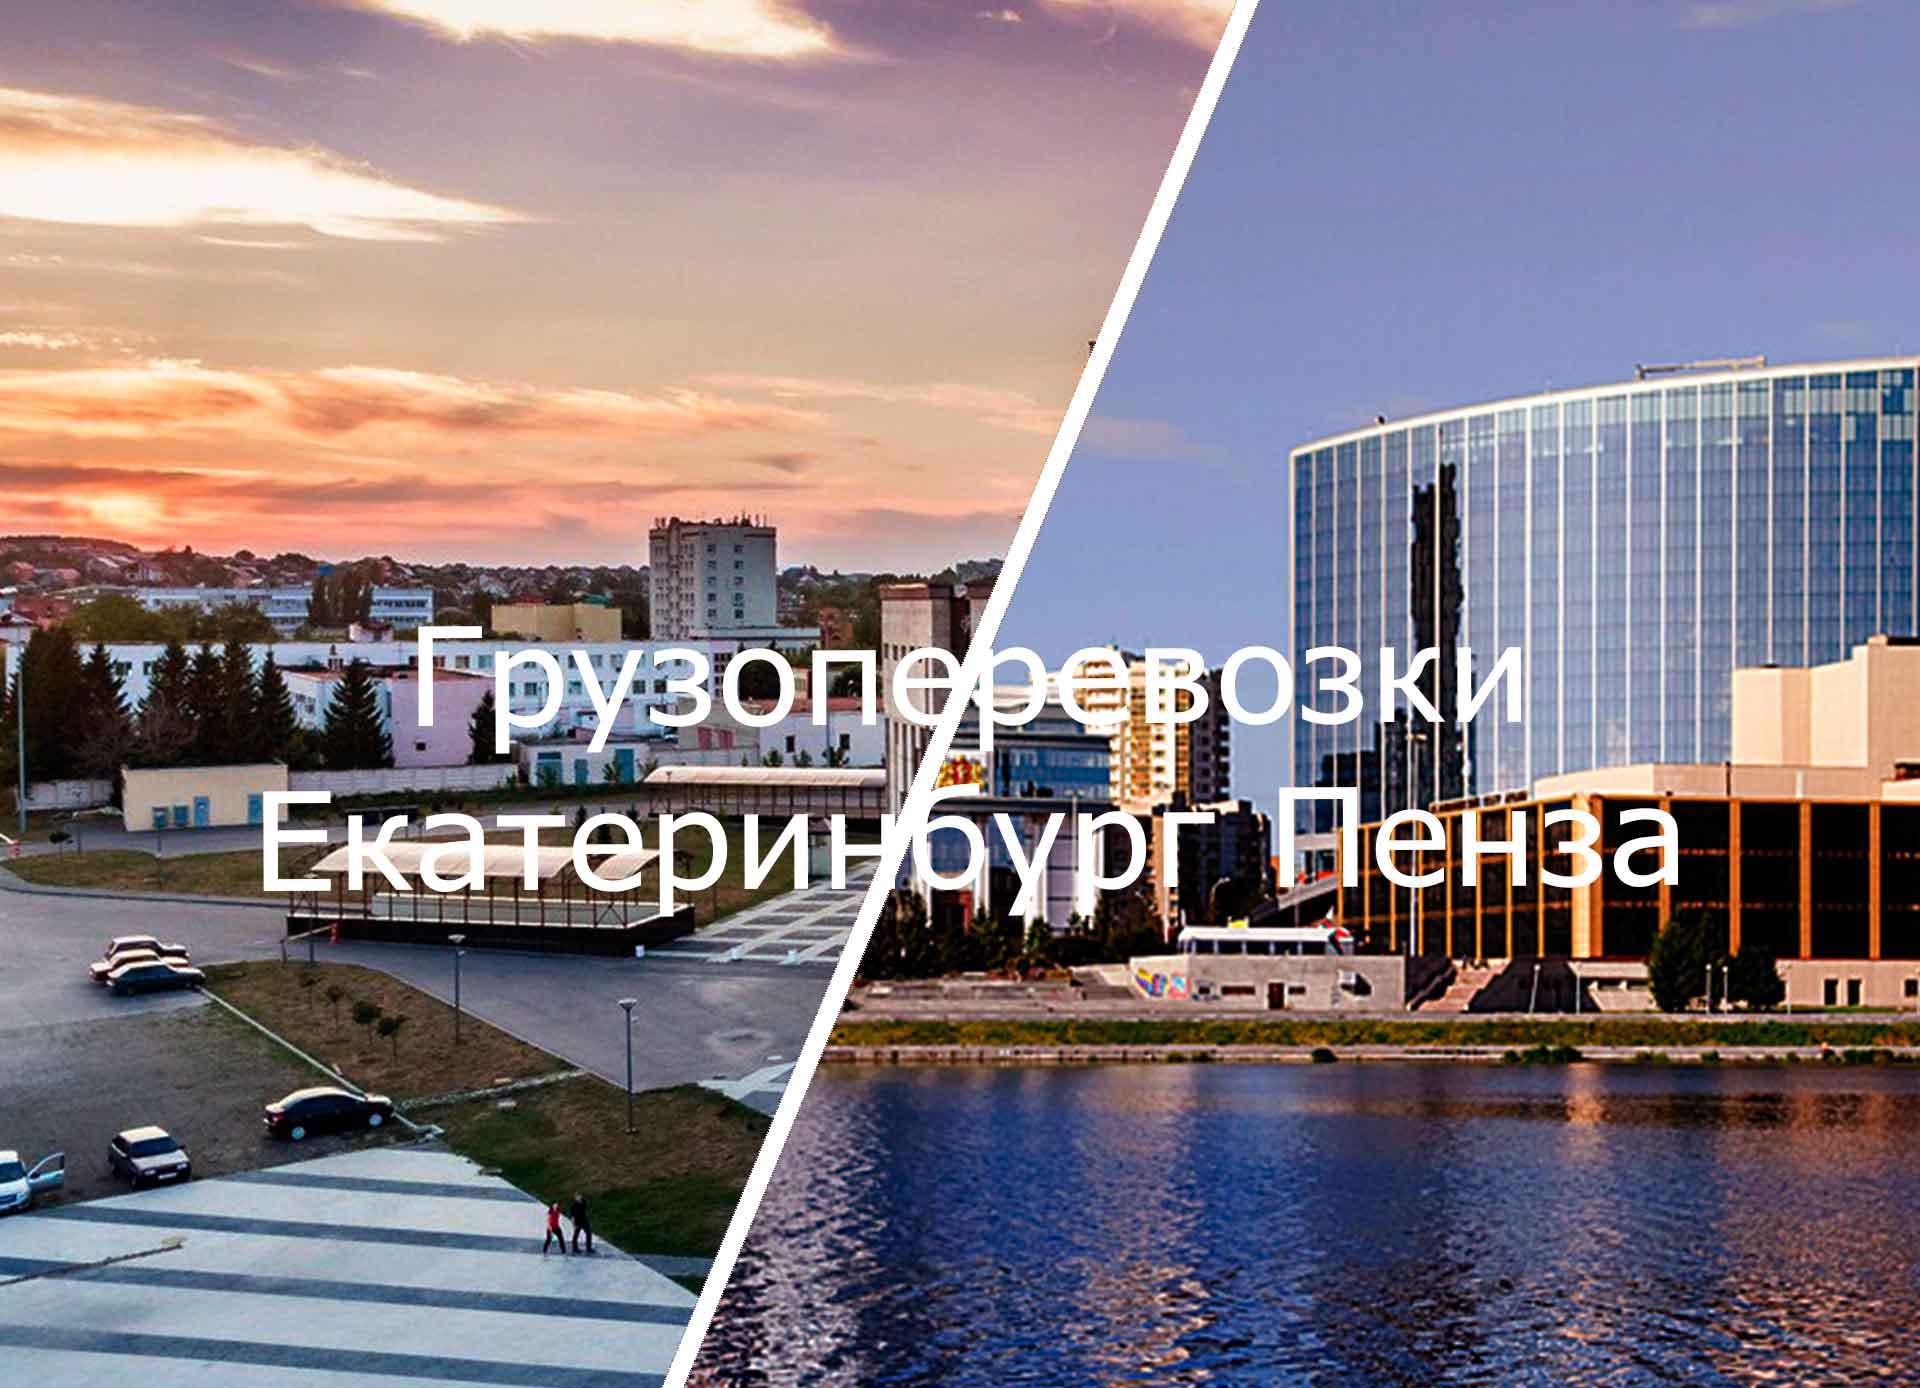 грузоперевозки екатеринбург пенза